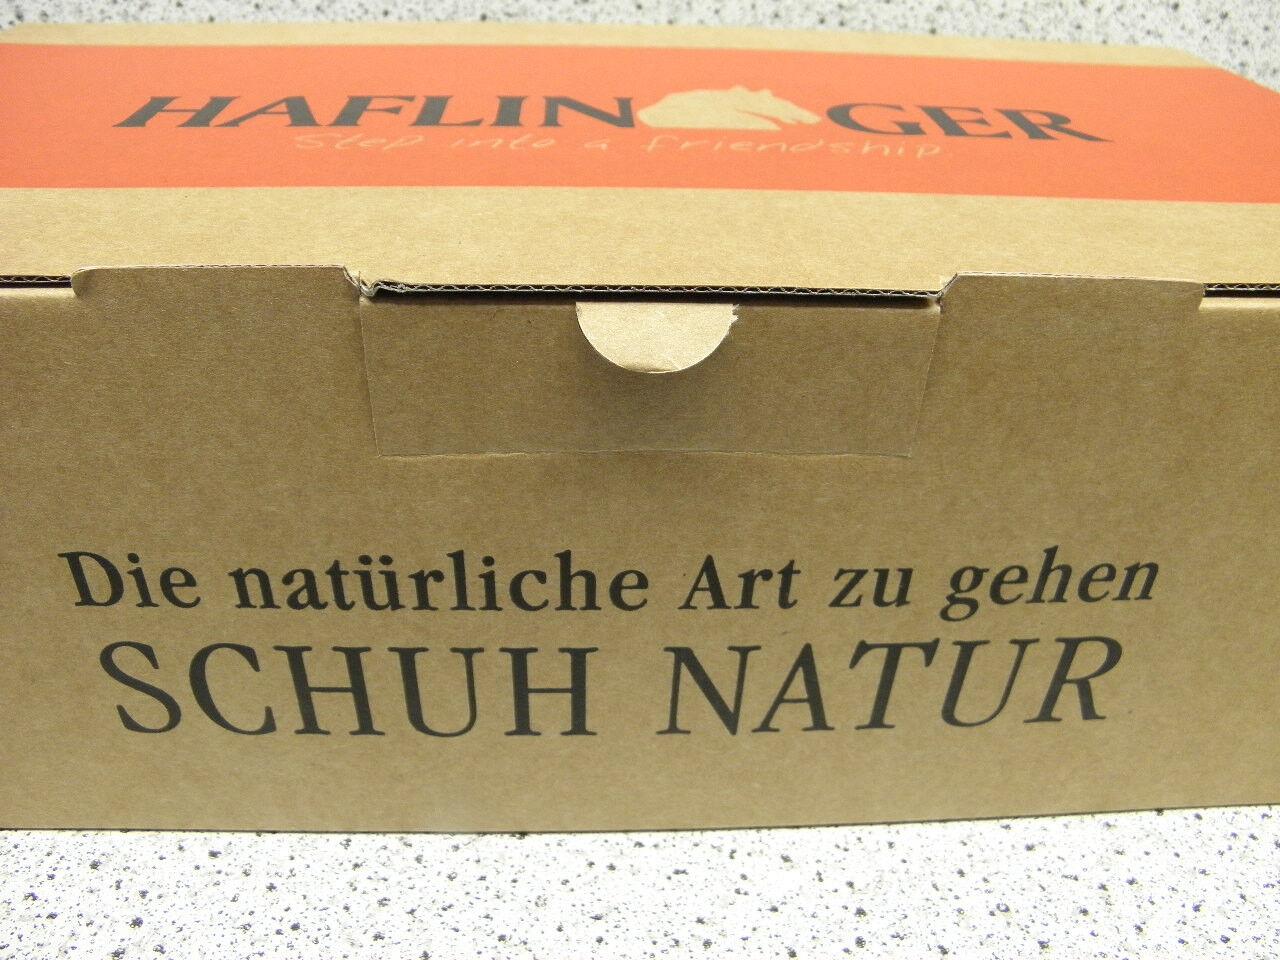 Haflinger Haflinger Haflinger  riduce,